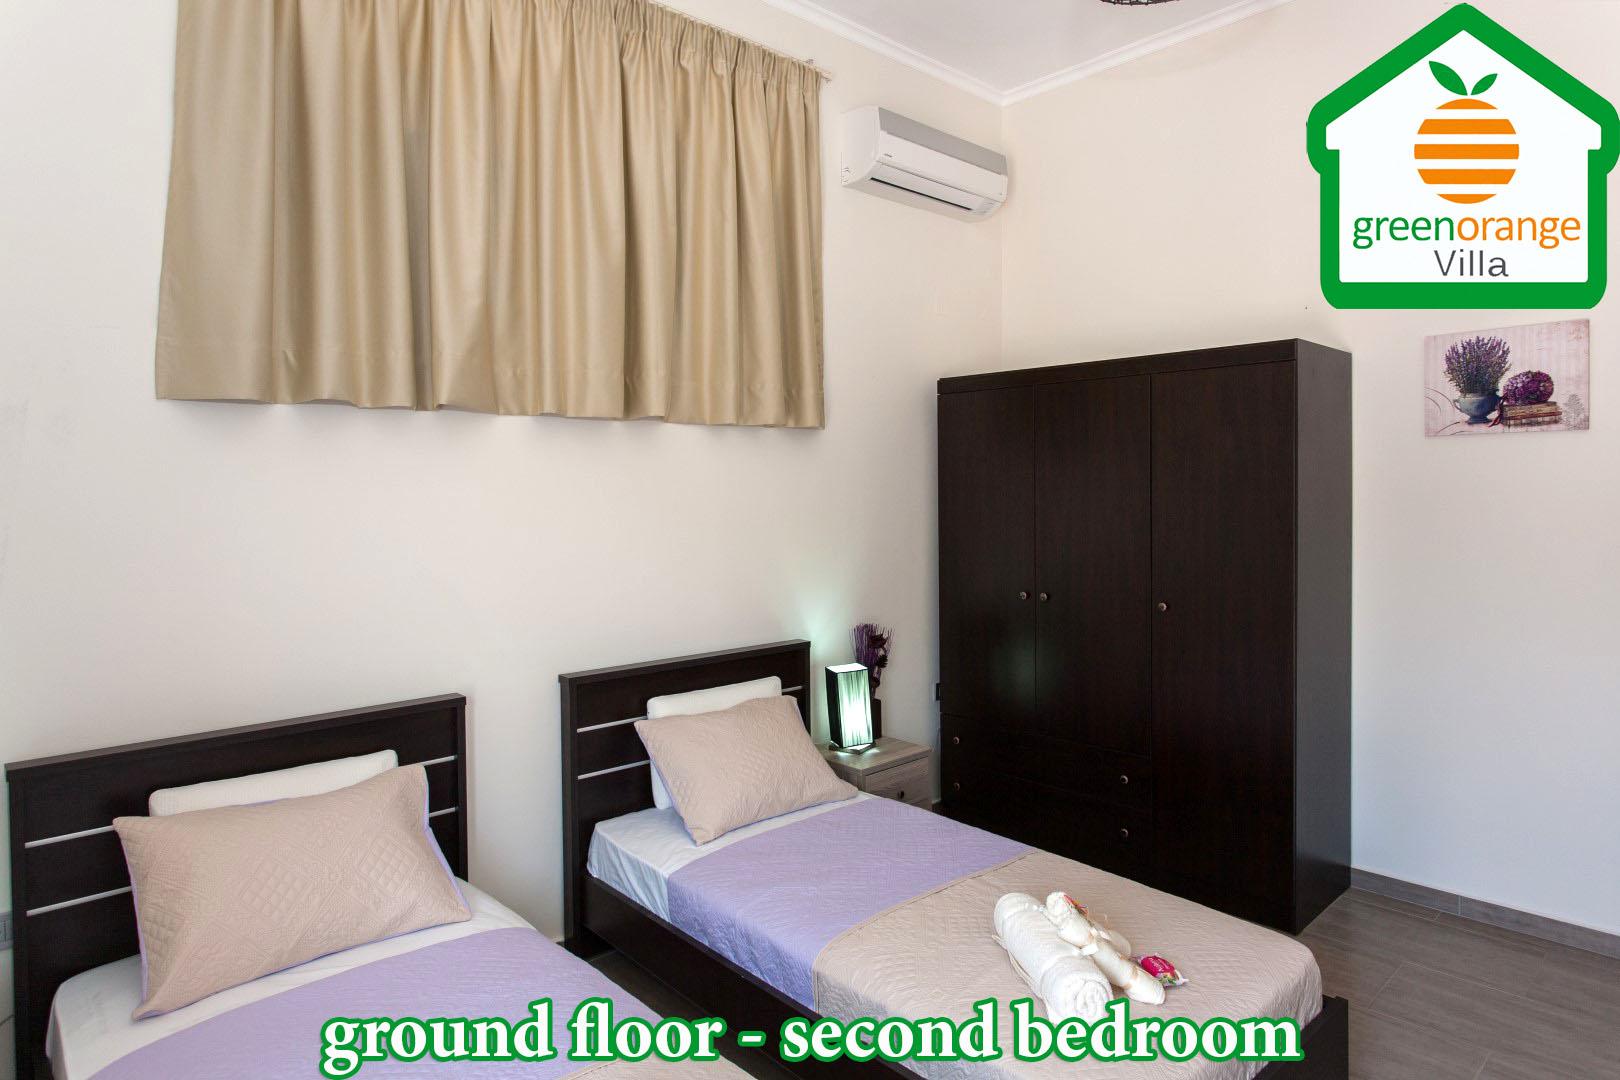 bedroom-ground-floor-2-green-orange-villa-chania-crete